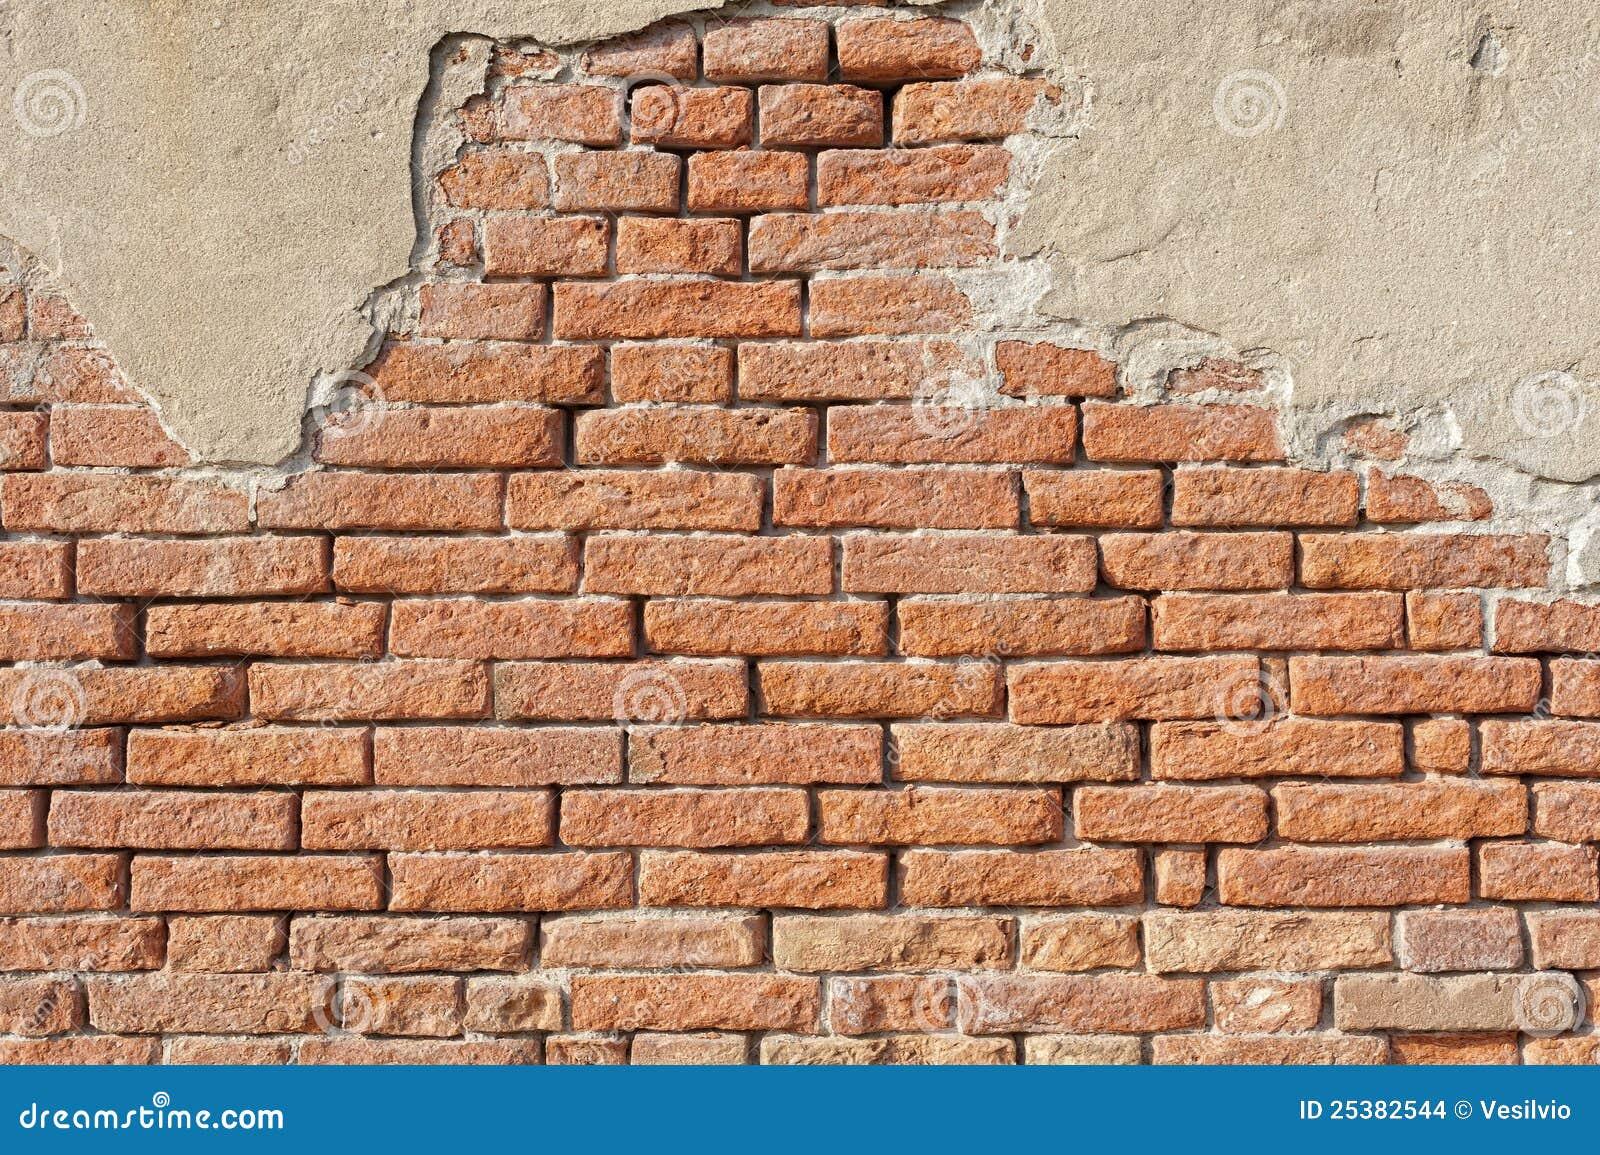 Ancient Brick Wall Stock Photo Image Of Concept Scraped